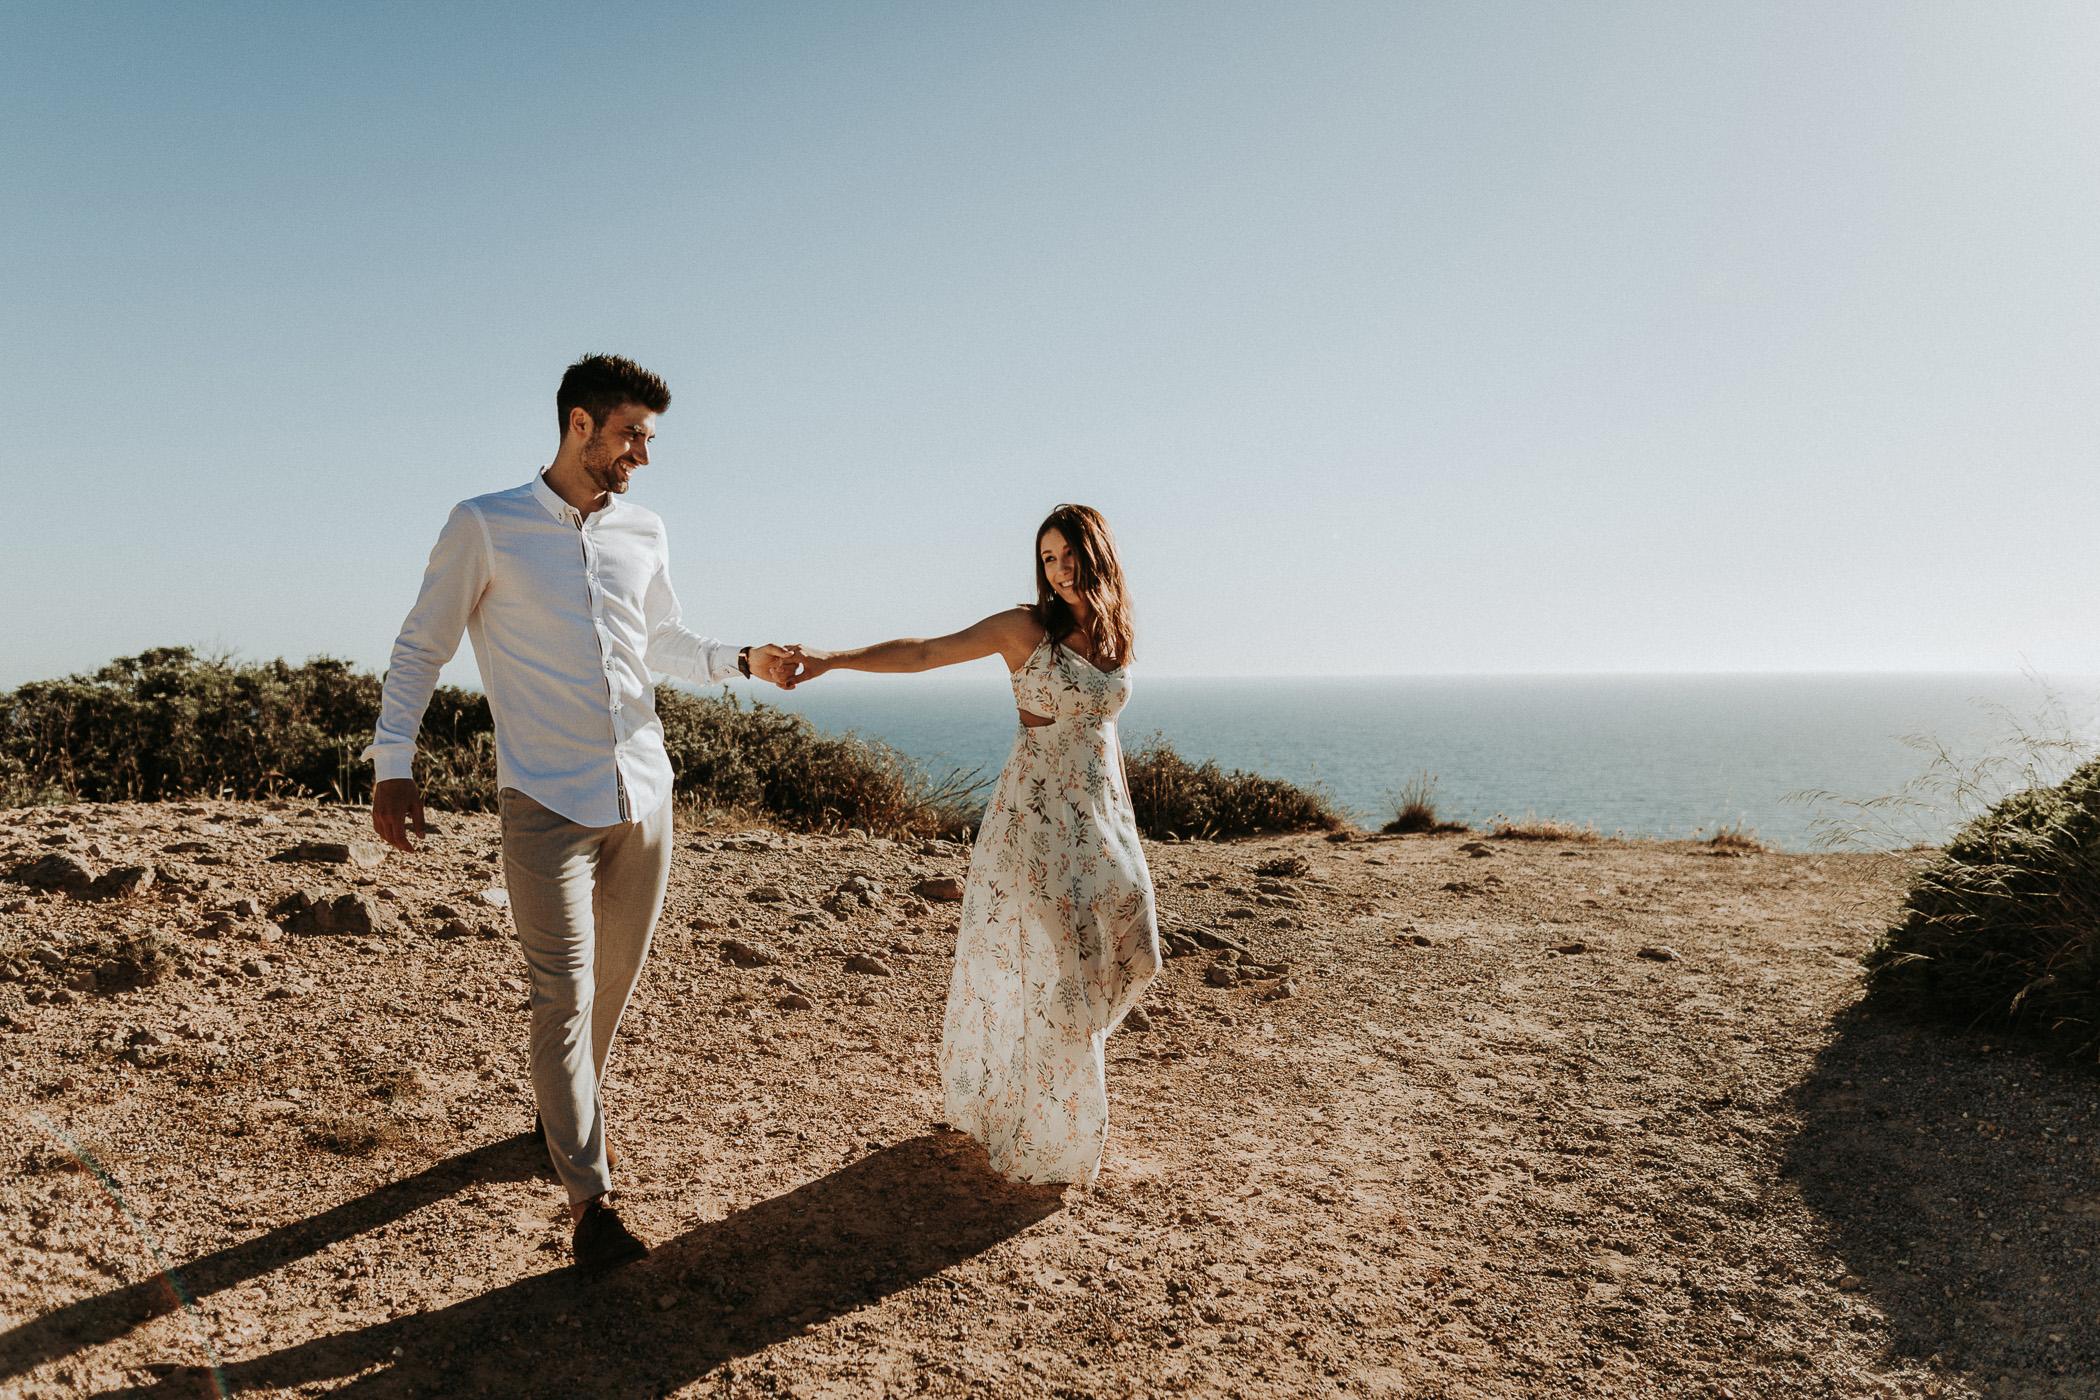 DanielaMarquardtPhotography_wedding_elopement_mallorca_spain_calapi_palma_lauraandtoni_146